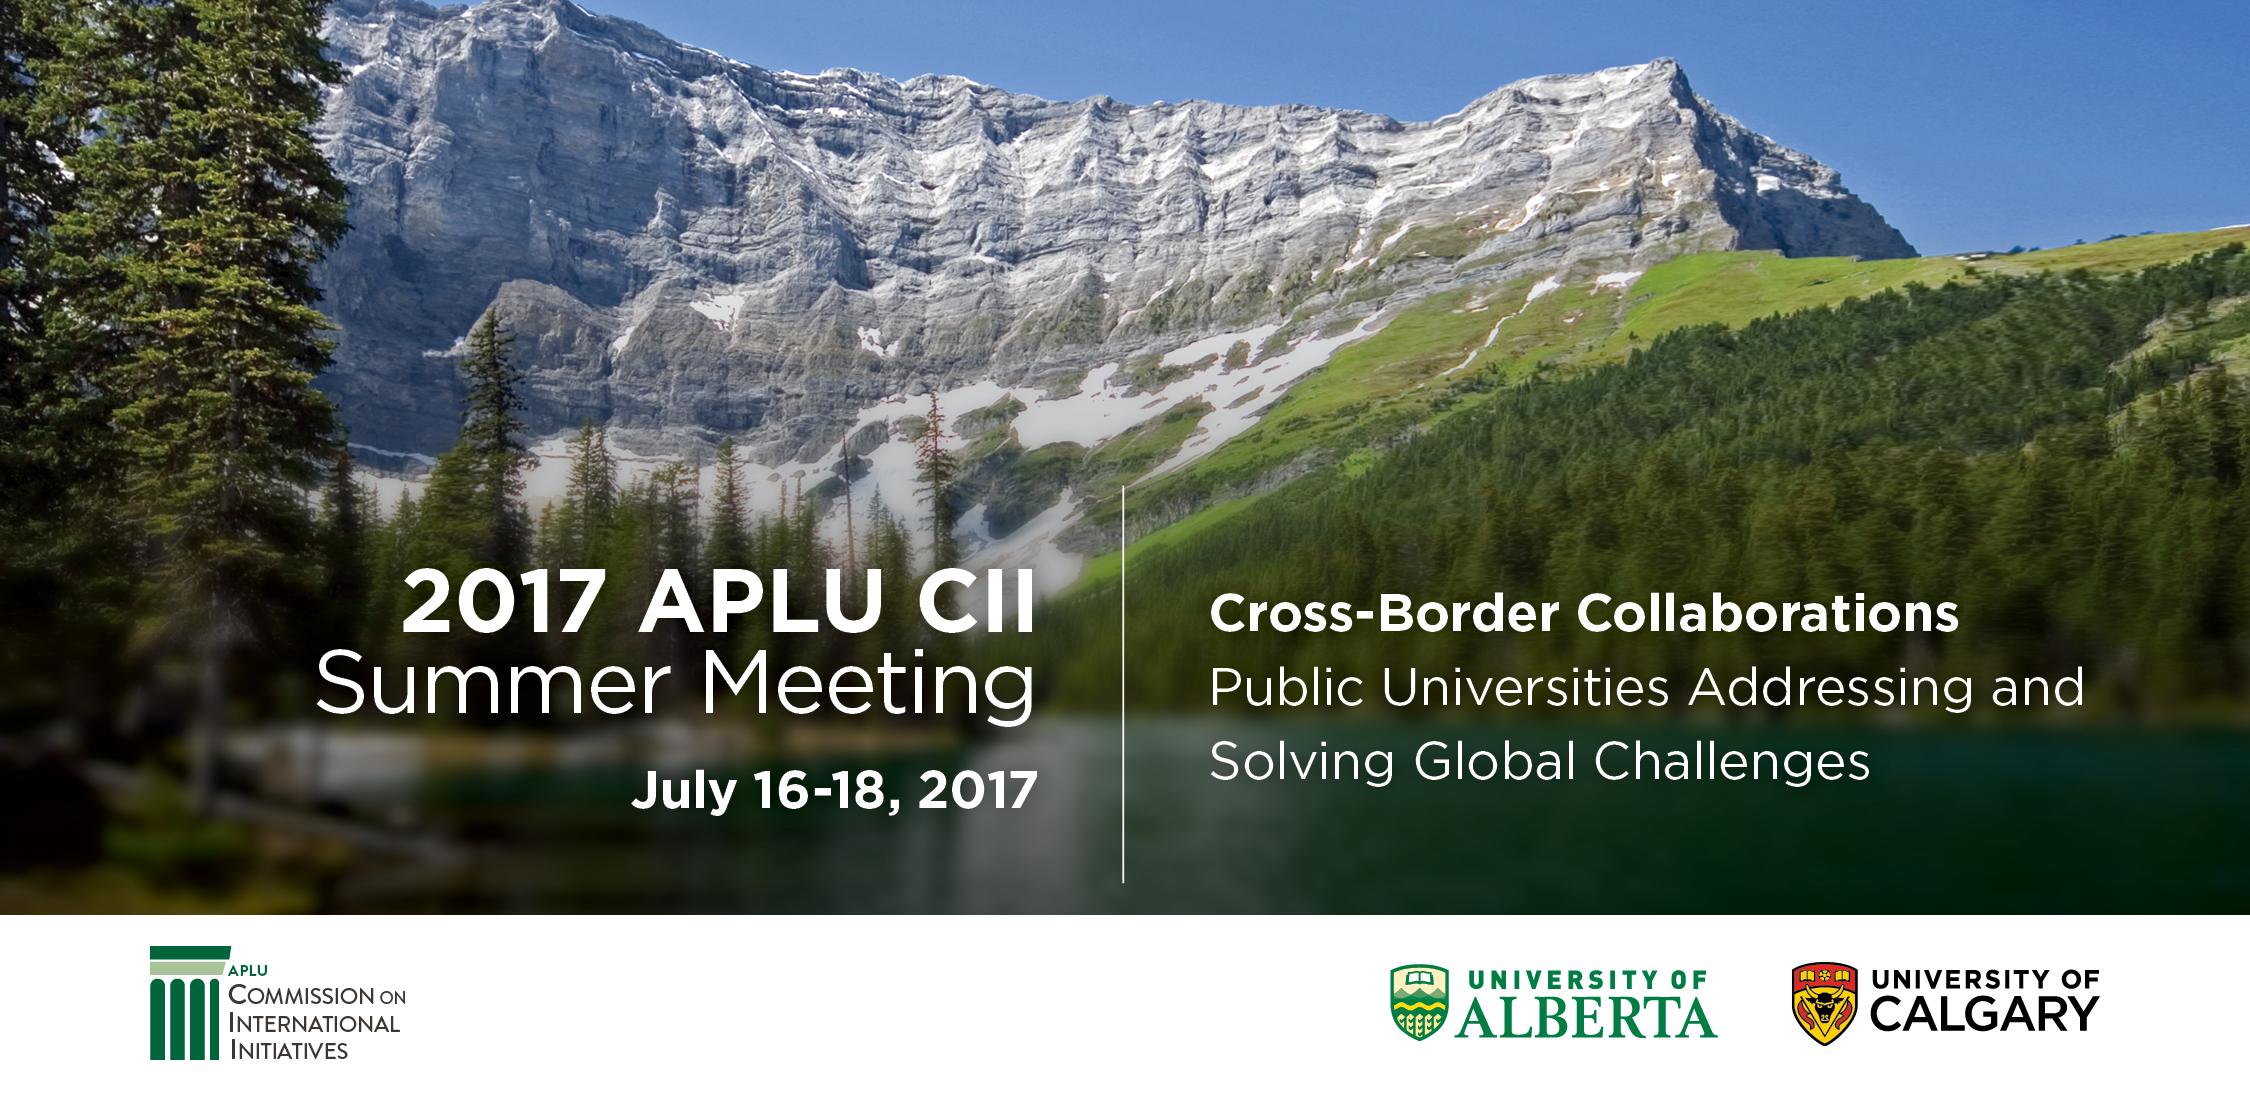 2017 APLU CII Summer Meeting